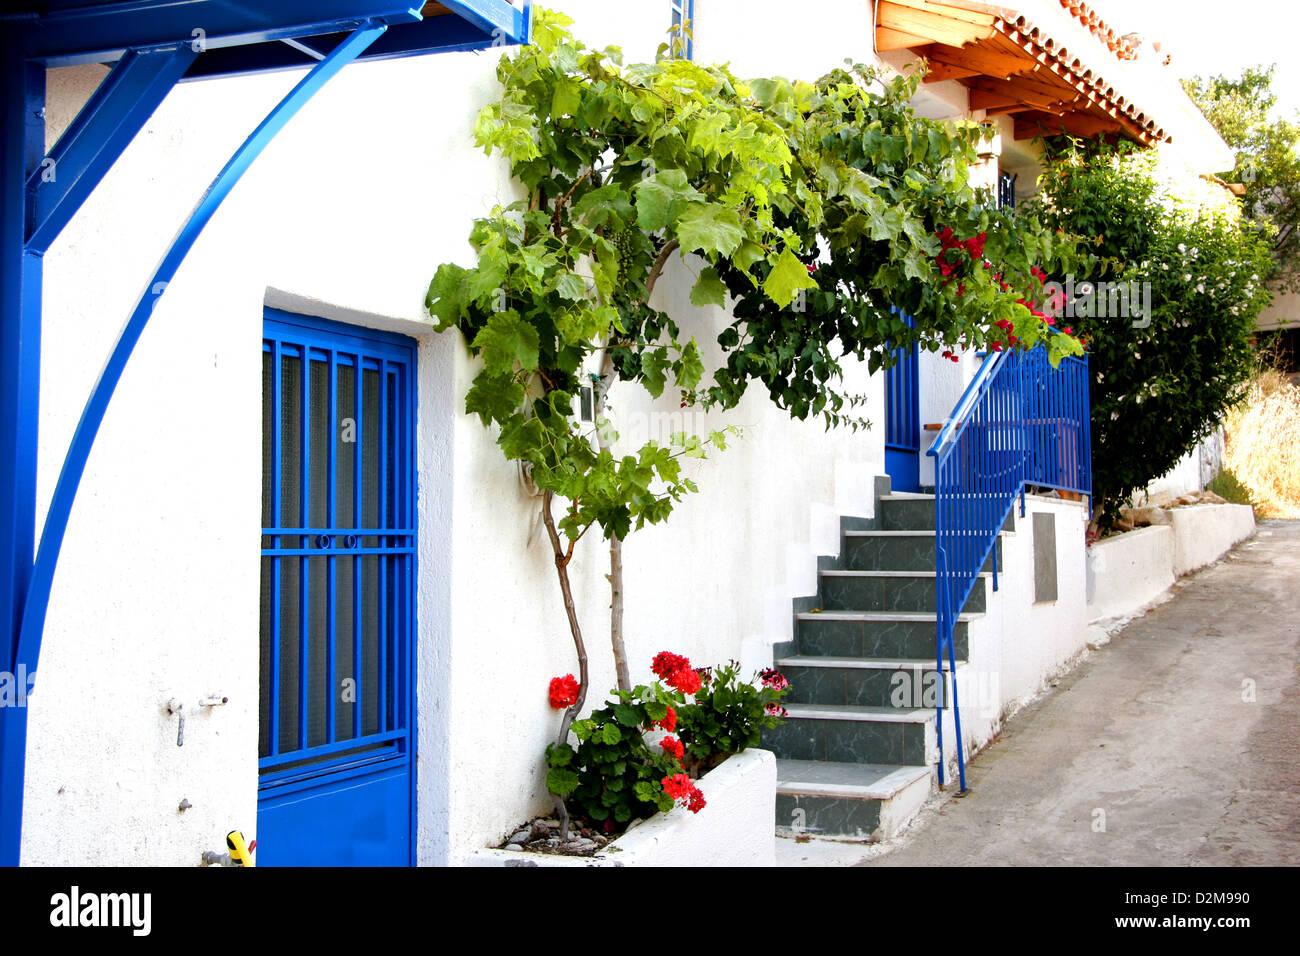 White House In Crete Blue Stock Photos & White House In Crete Blue ...